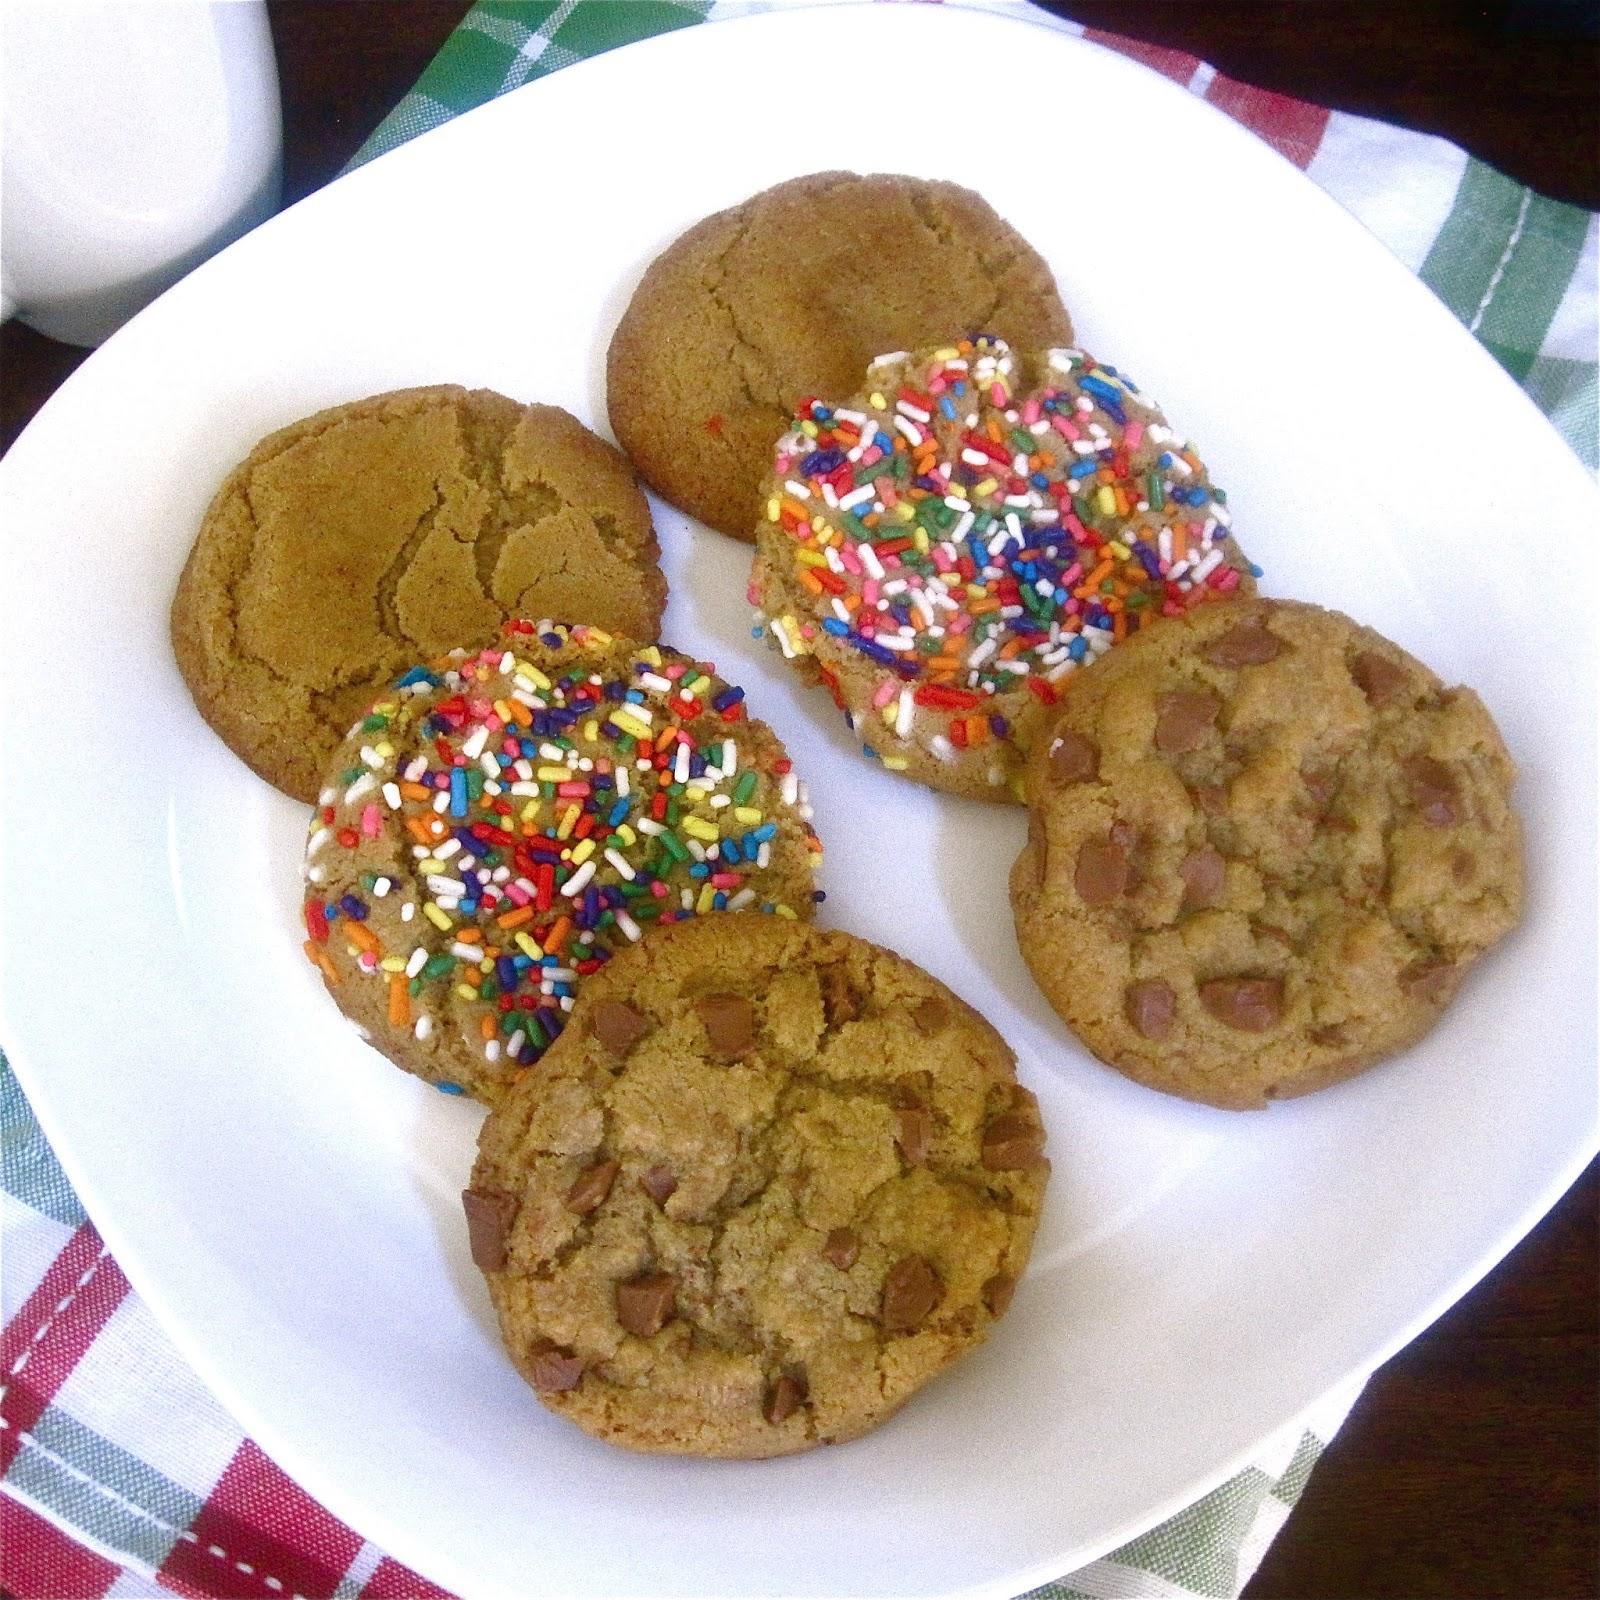 Snickers Bar Stuffed Chocolate Chip Cookies - Sallys Baking Addiction